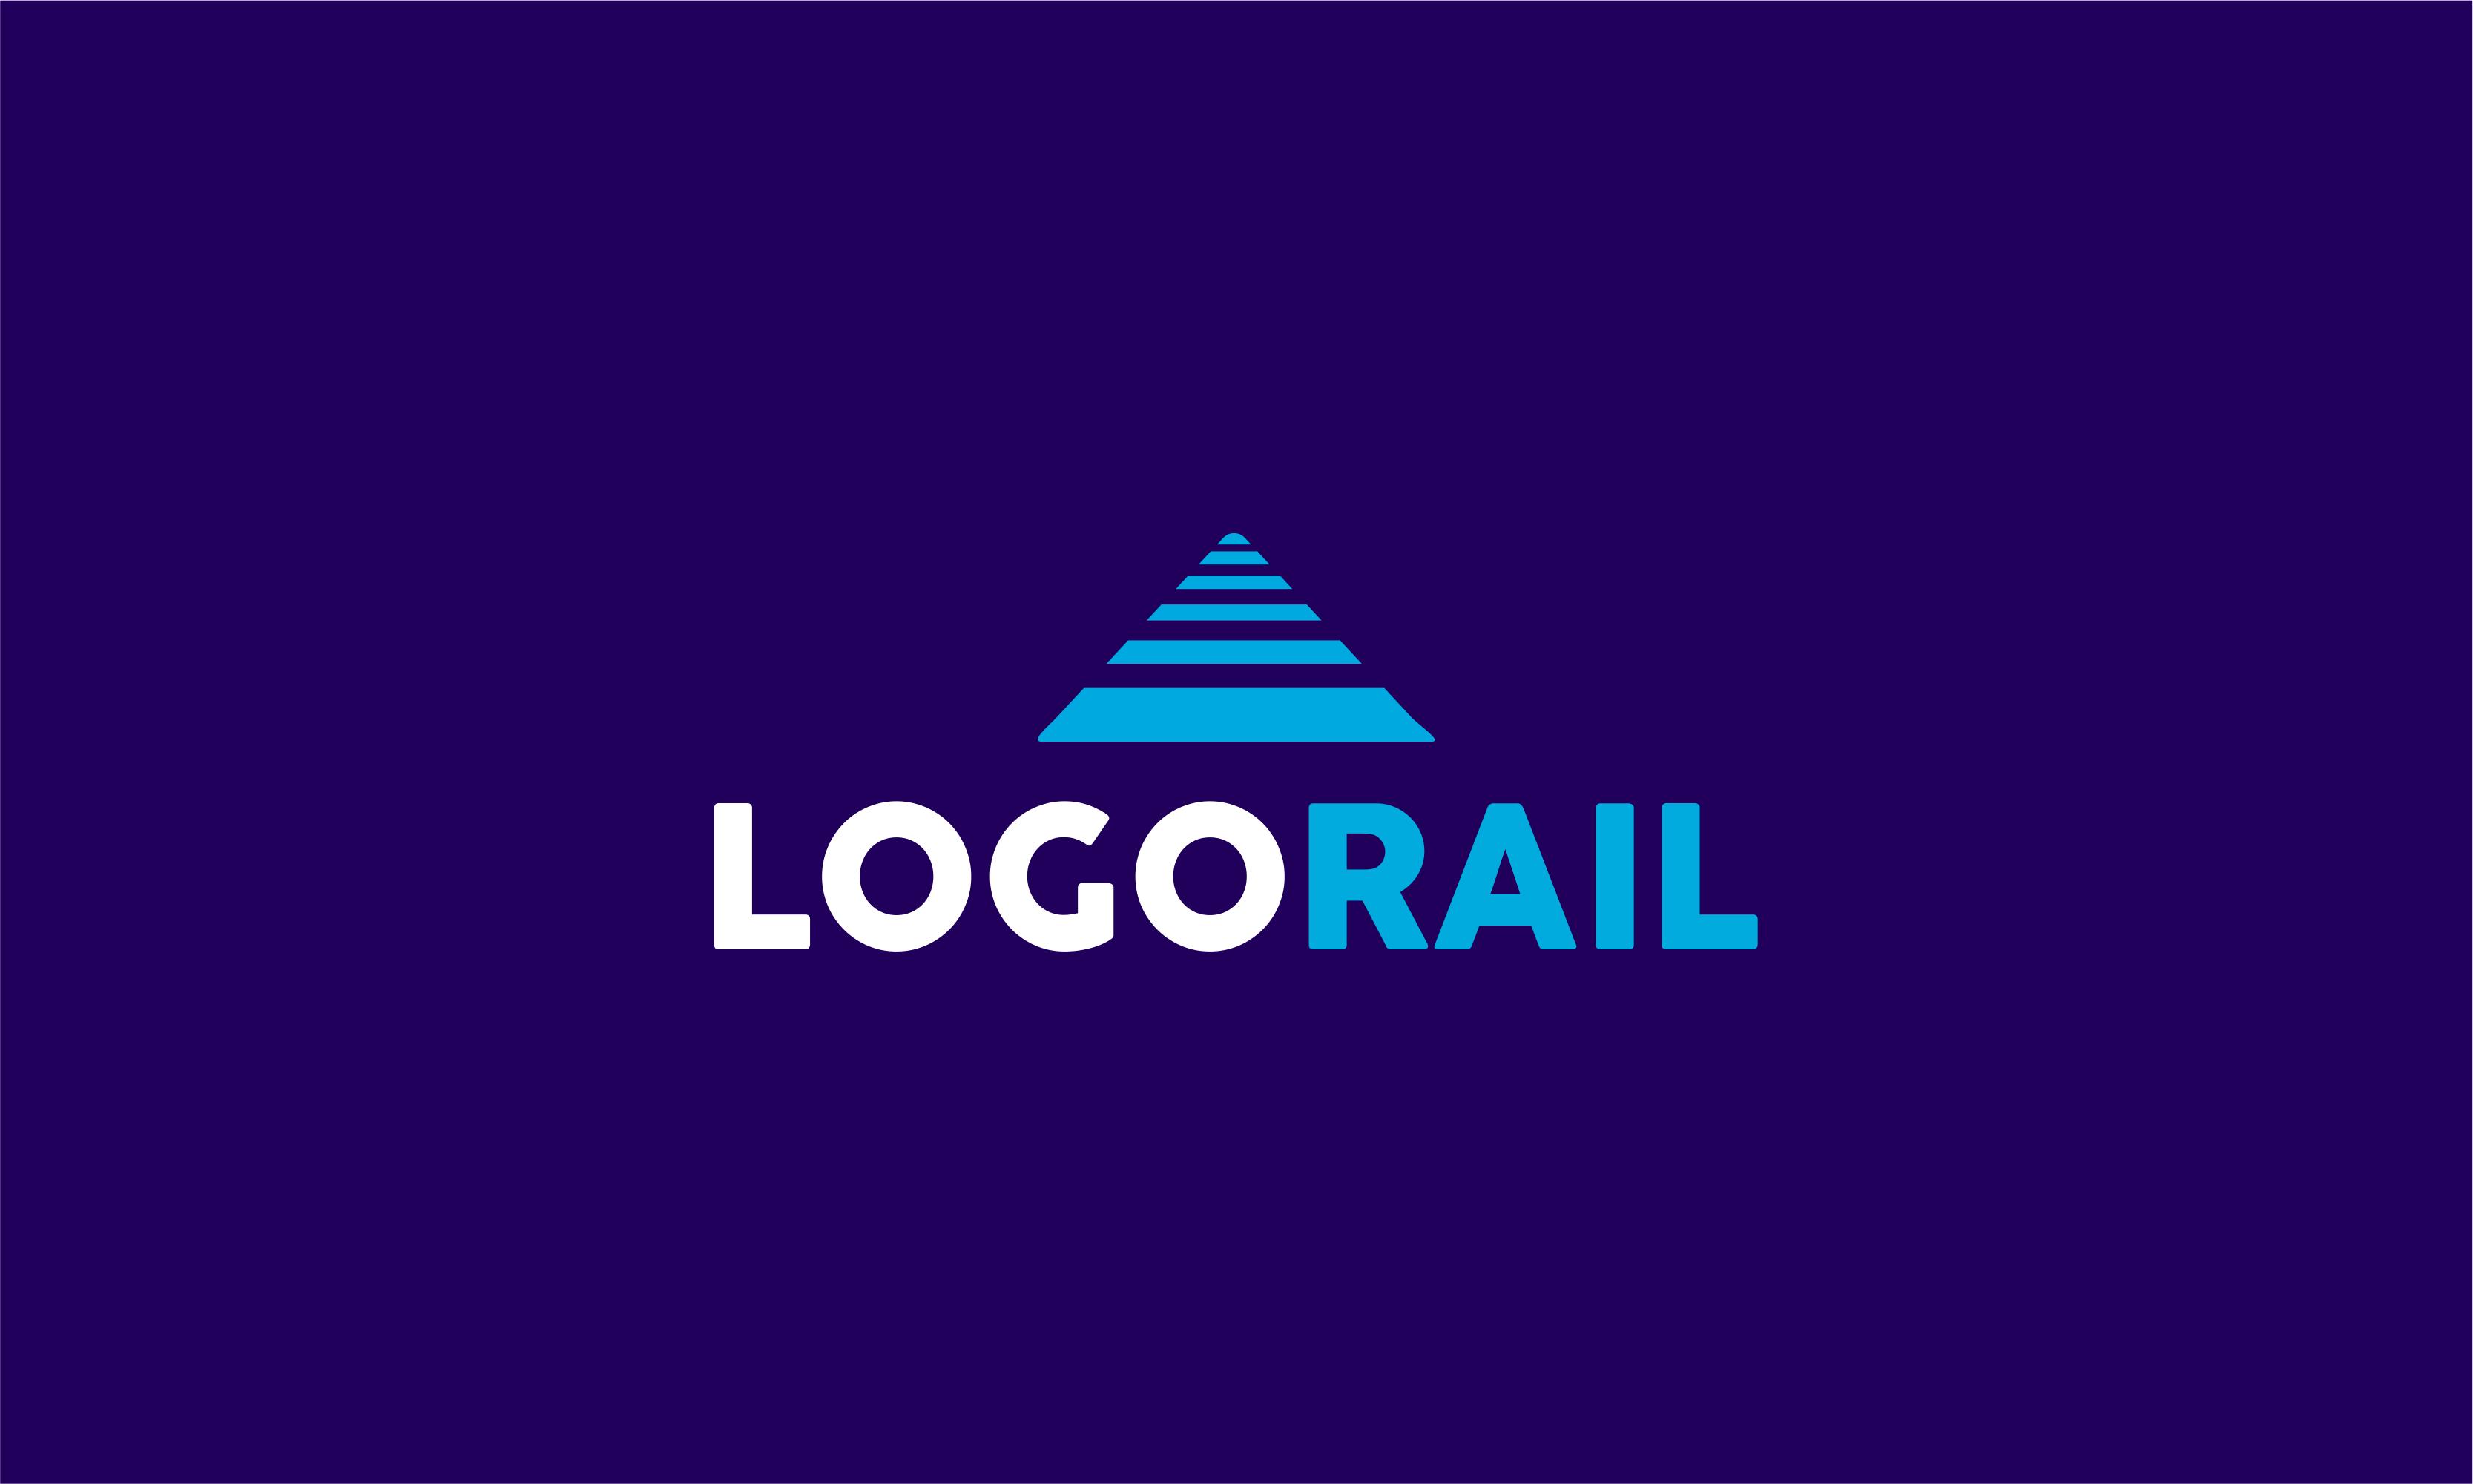 Logorail